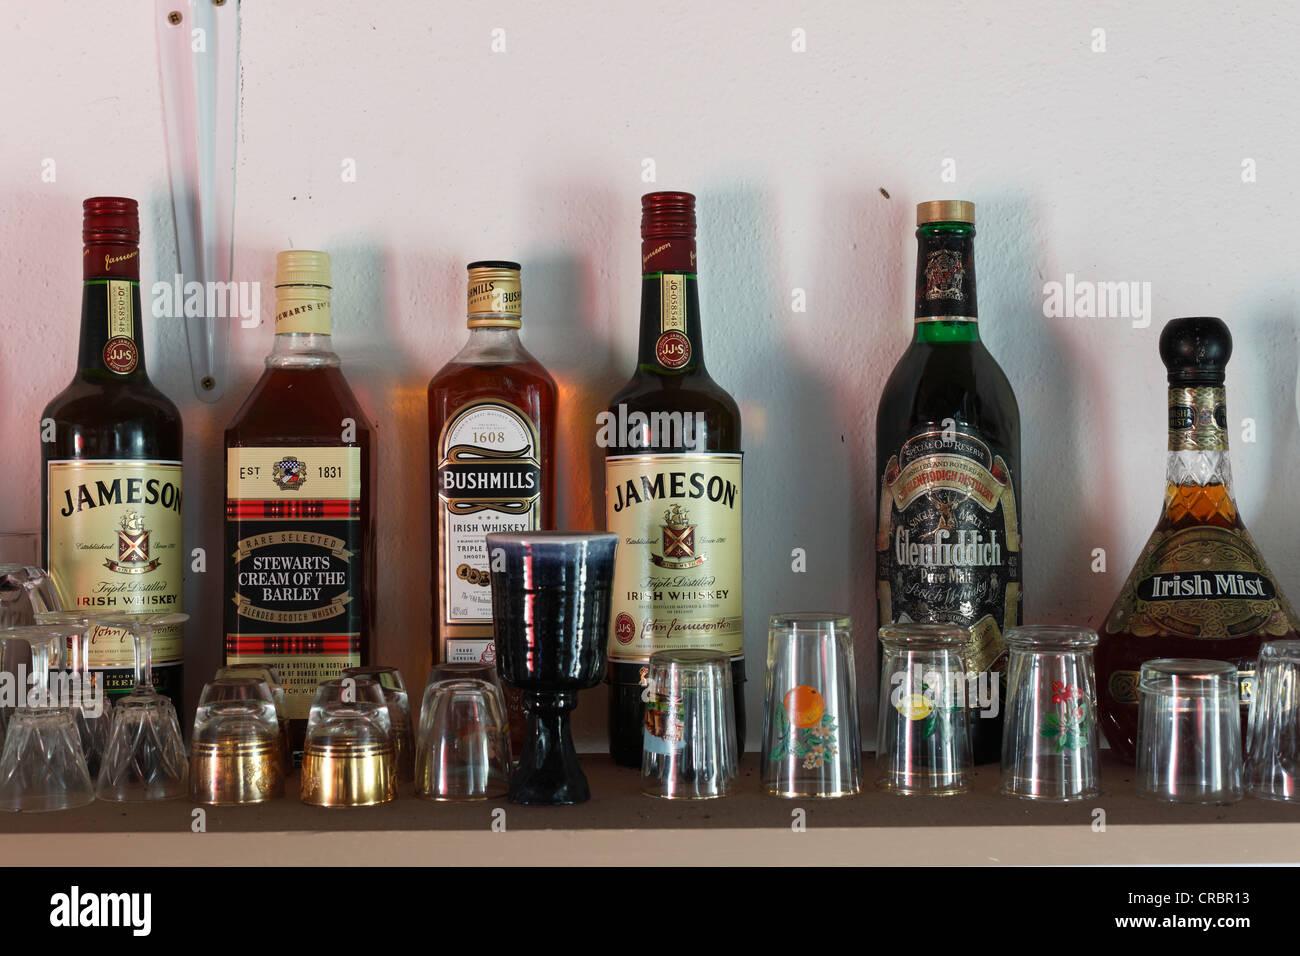 Whiskey bottles, Father Mcdyer Folk Museum, Glencolumbcille, also Glencolumbkille, County Donegal, Ireland, Europe - Stock Image